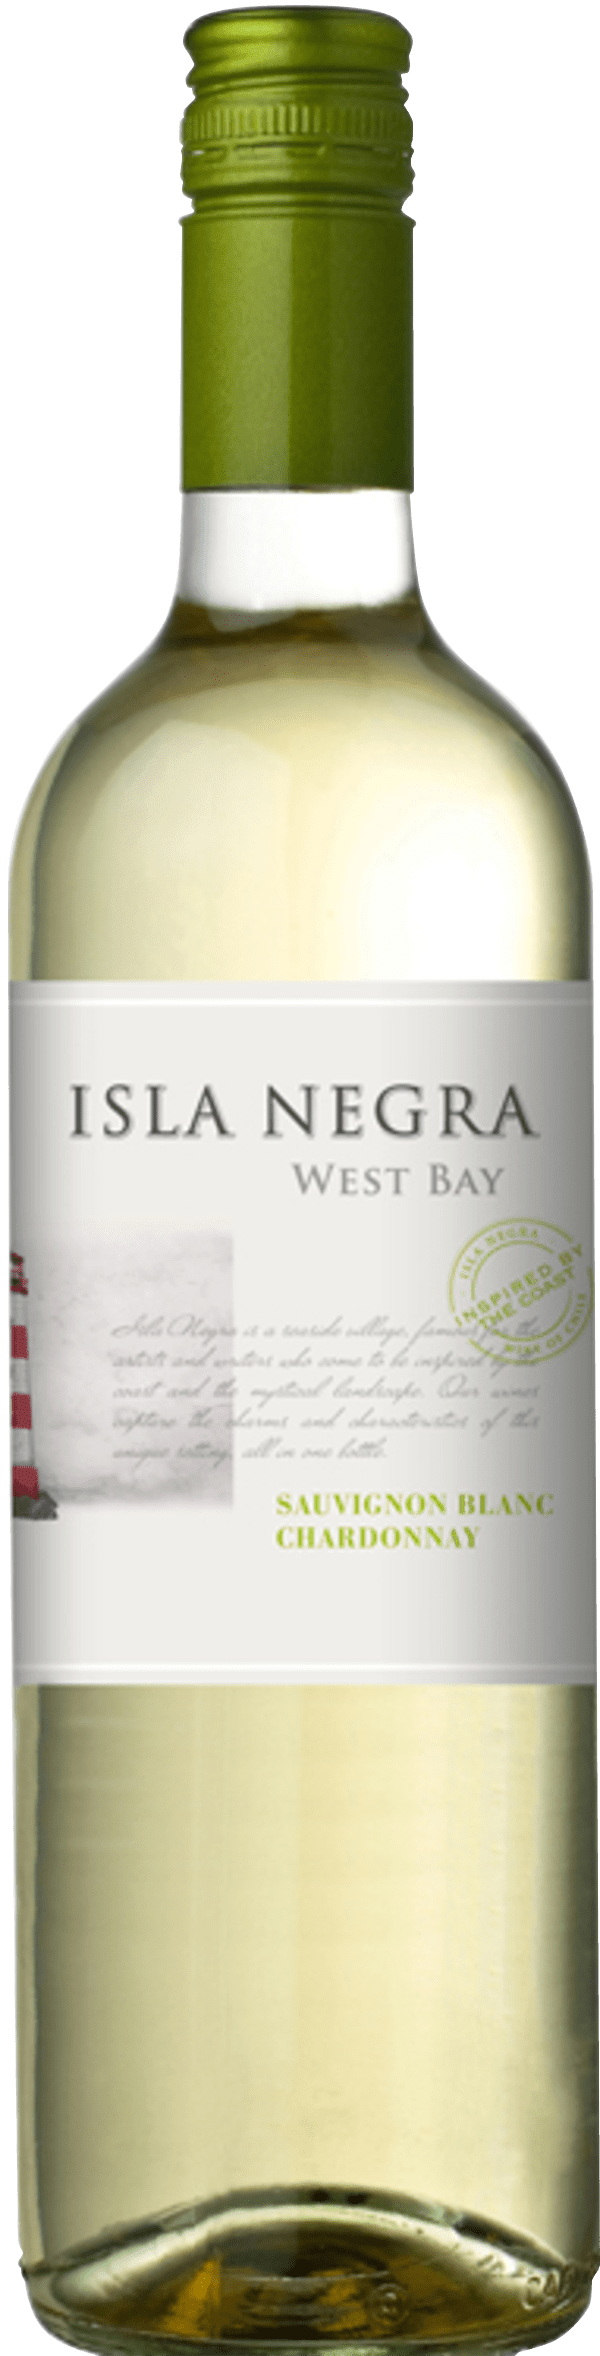 isla-negra-sauvignon-blanc-chardonnay-